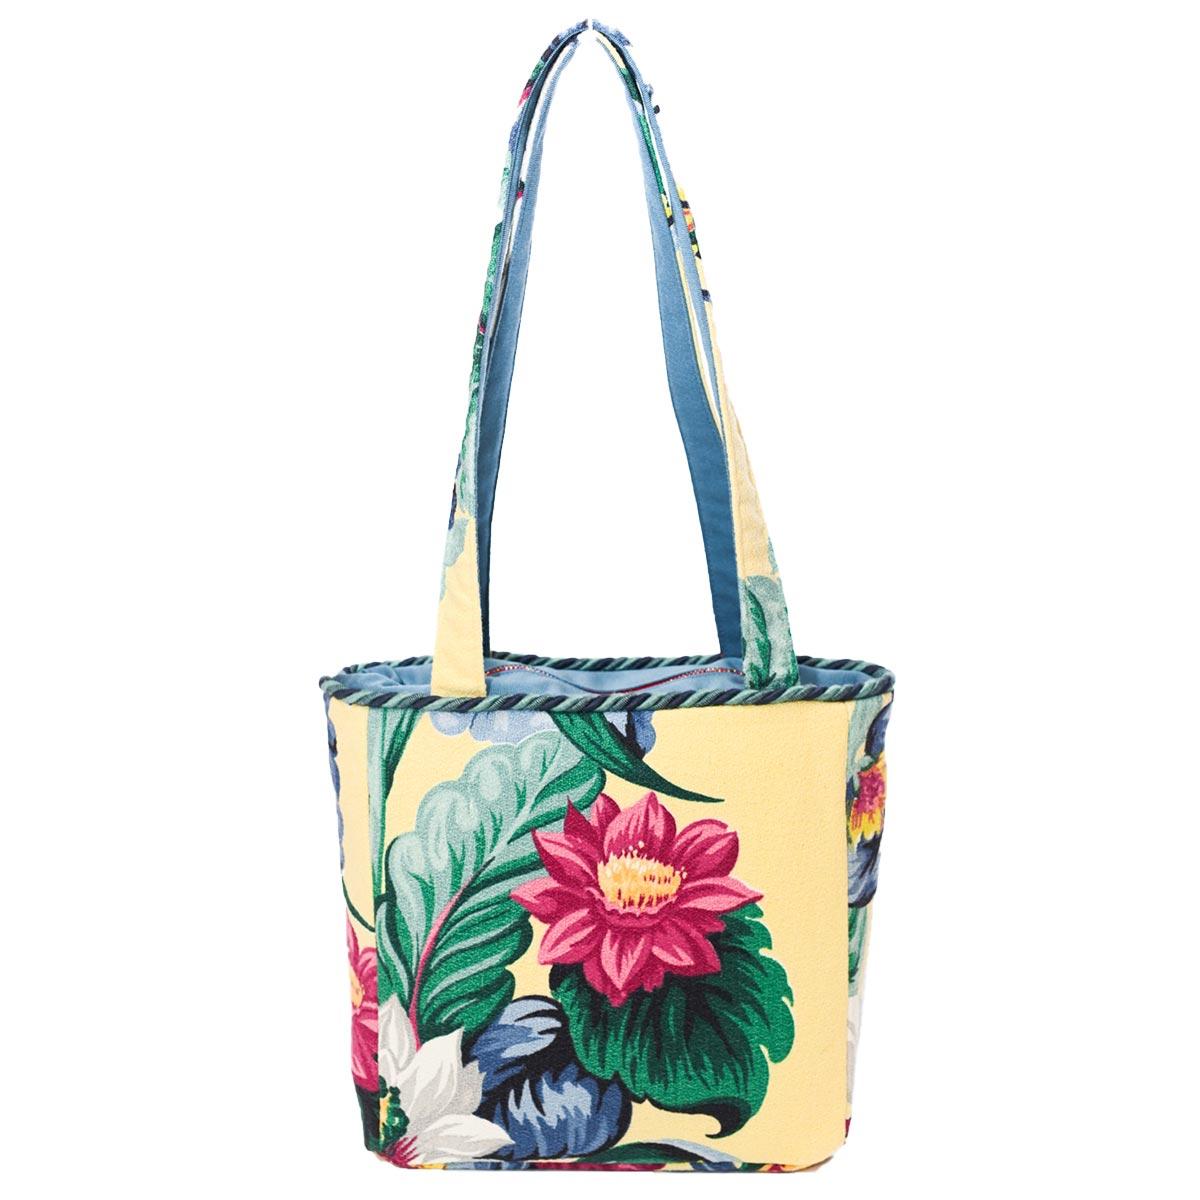 square bag floral motif on vanila DSC 6585